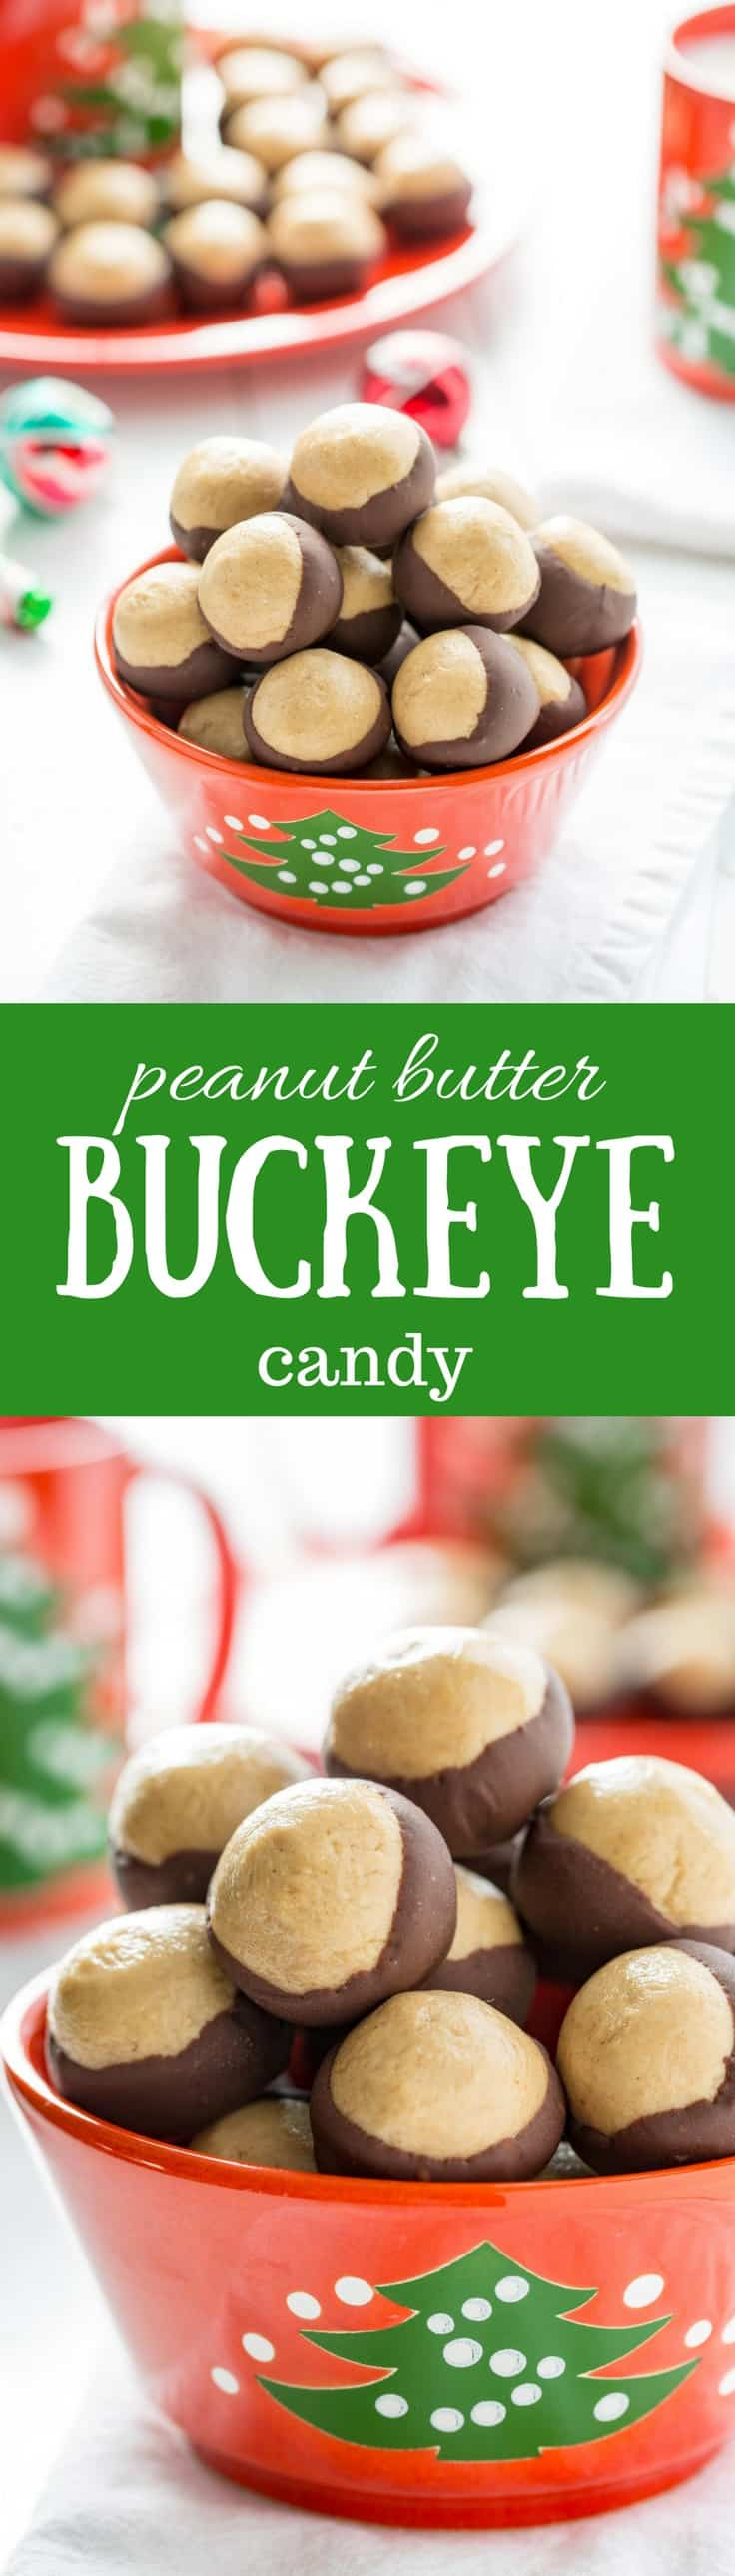 Peanut Butter Buckeye Candy ~ creamy, sweet peanut butter dough balls are partially dipped in chocolate to mimic the fruit of the Ohio Buckeye tree. www.savingdessert.com #savingroomfordessert #buckeyes #peanutbutterballs #christmascandy #buckeye